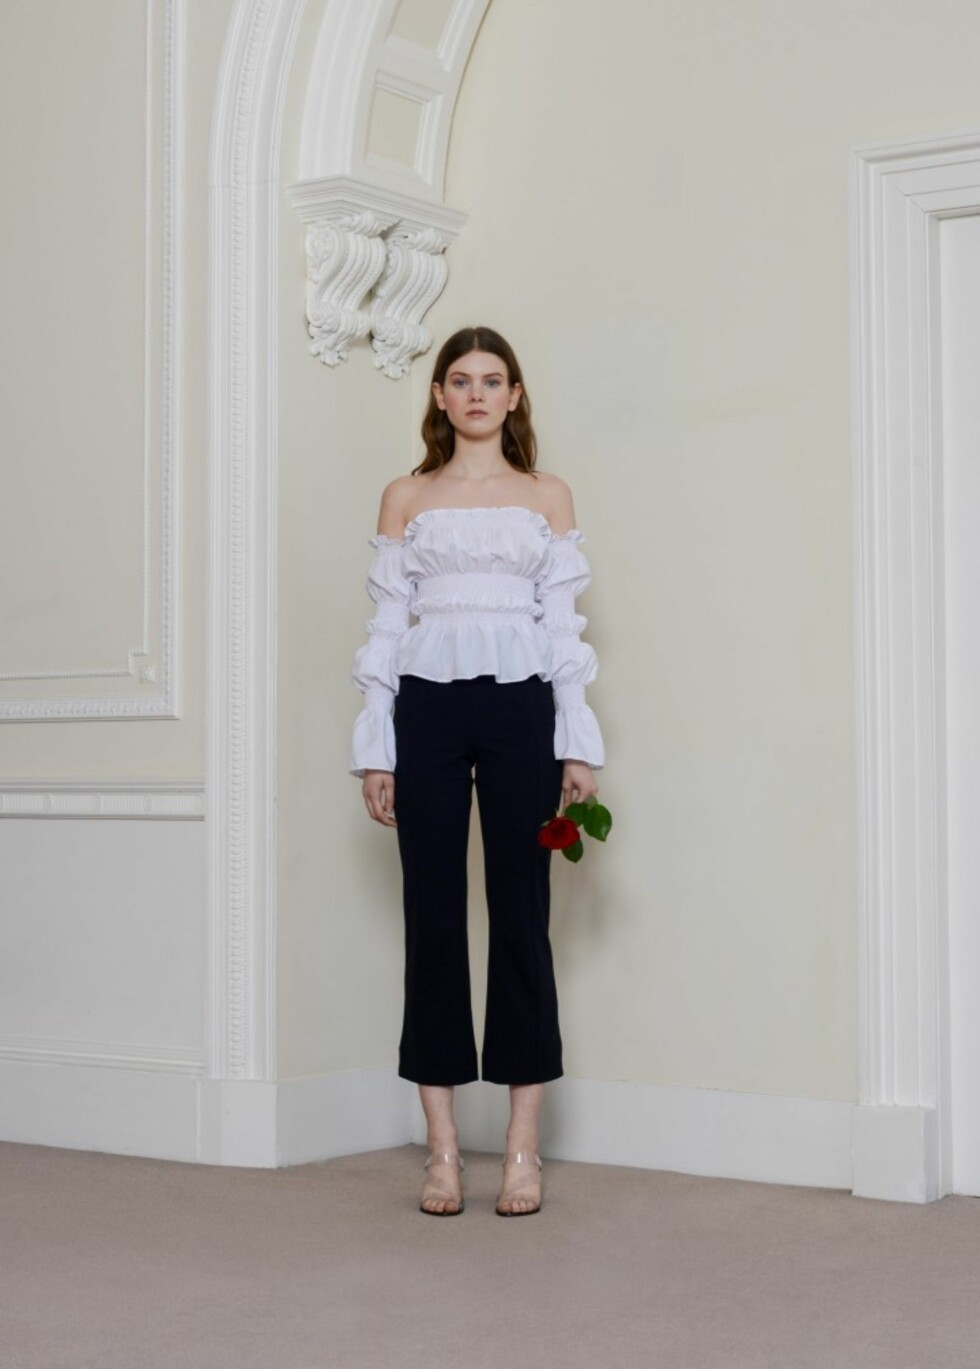 Hvit topp fra Olivia Rose the Label |755,-| https://oliviarosethelabel.com/shop/the-jemima-top-white/